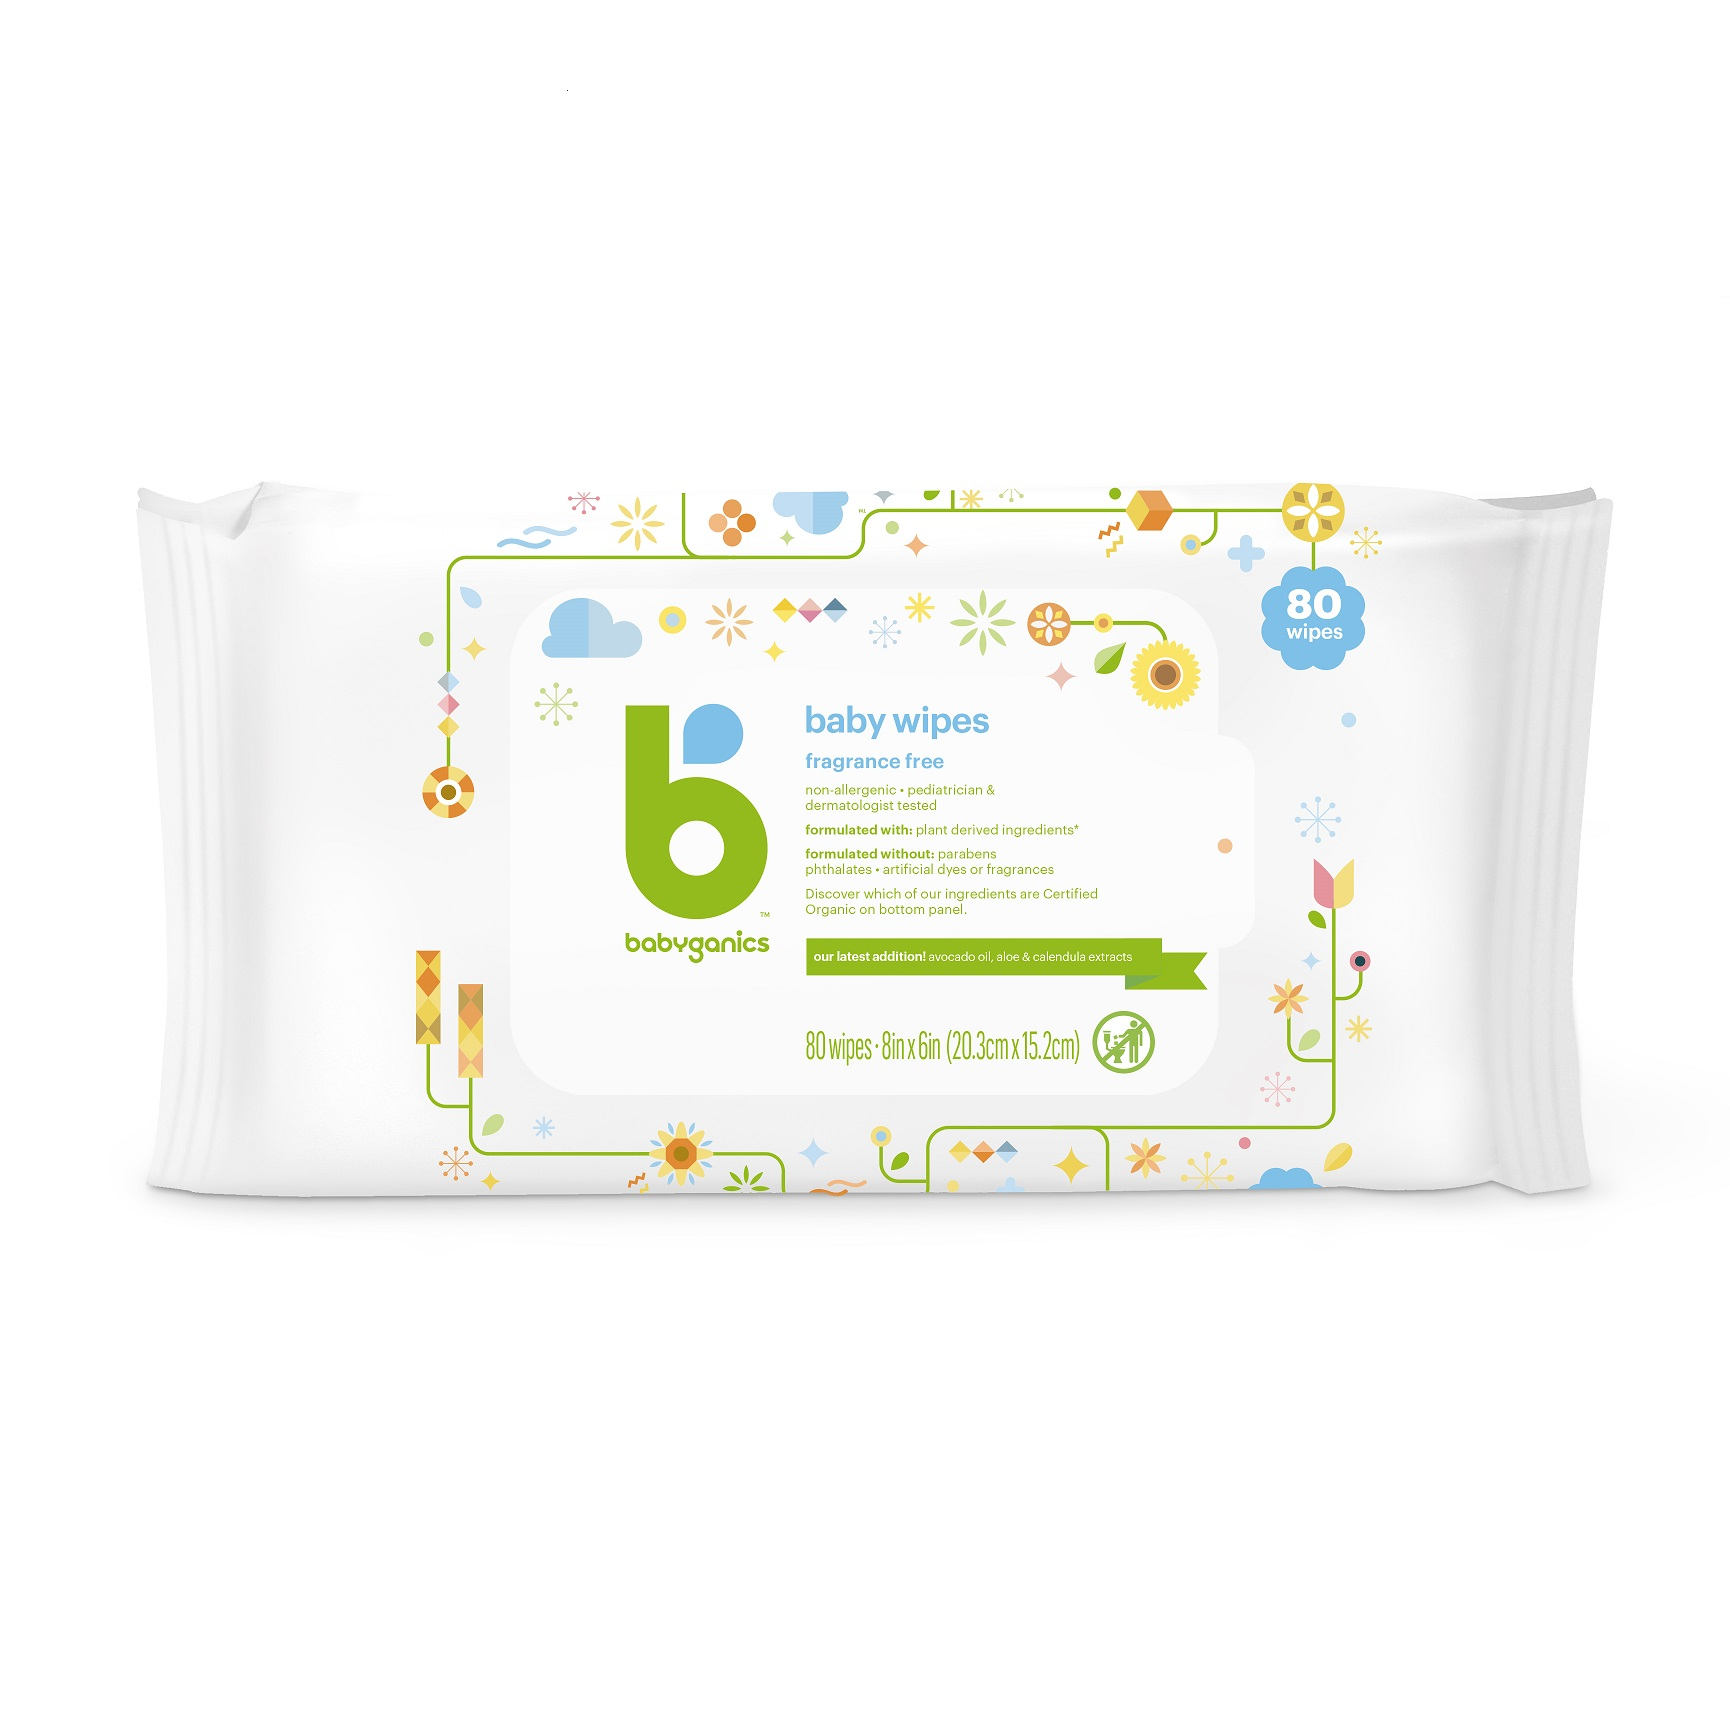 babyganics face, hand & baby wipes fragrance free